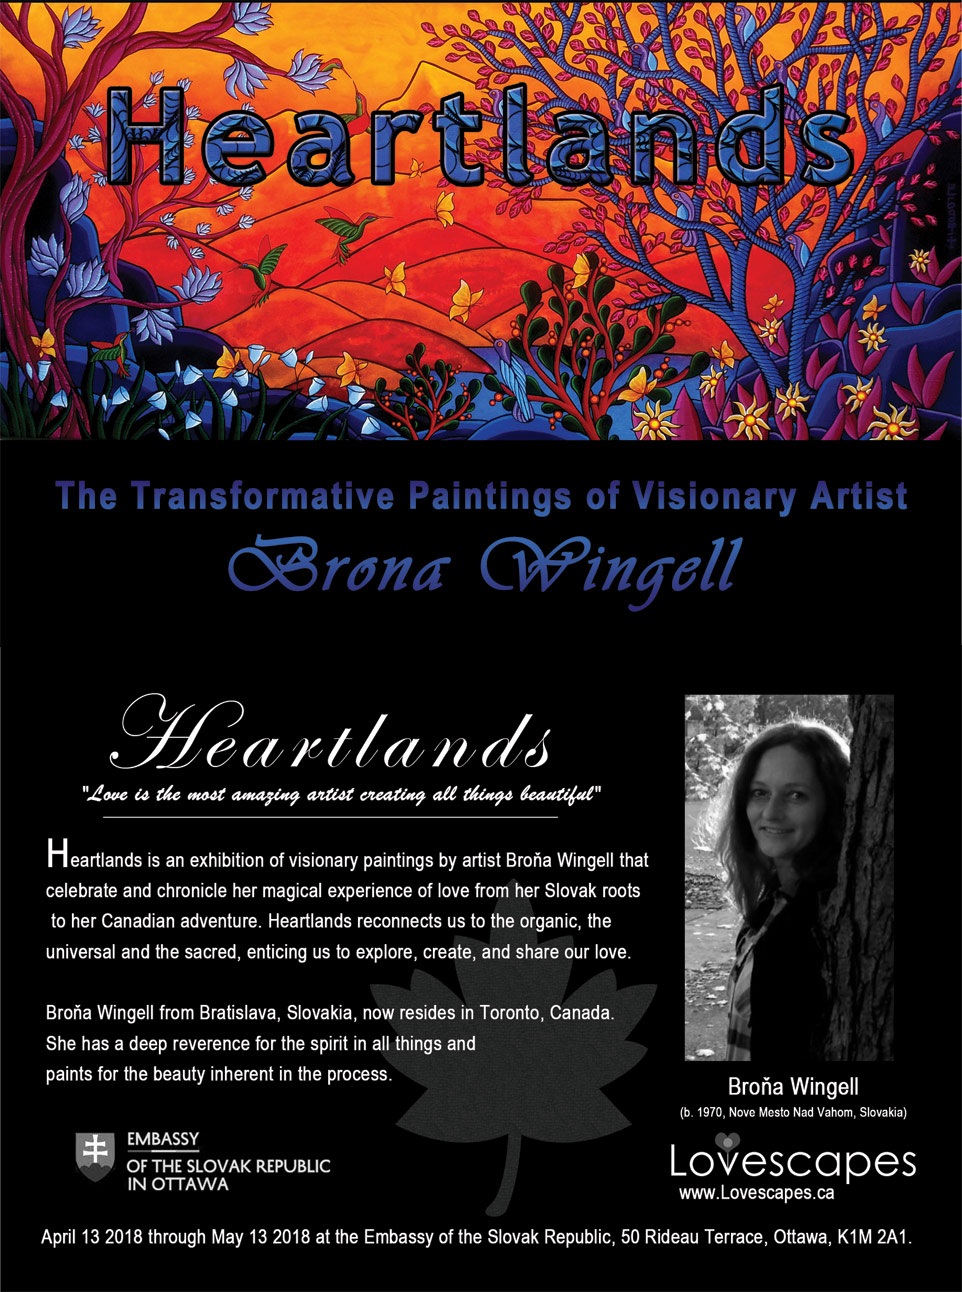 heartlands-banner-portrait